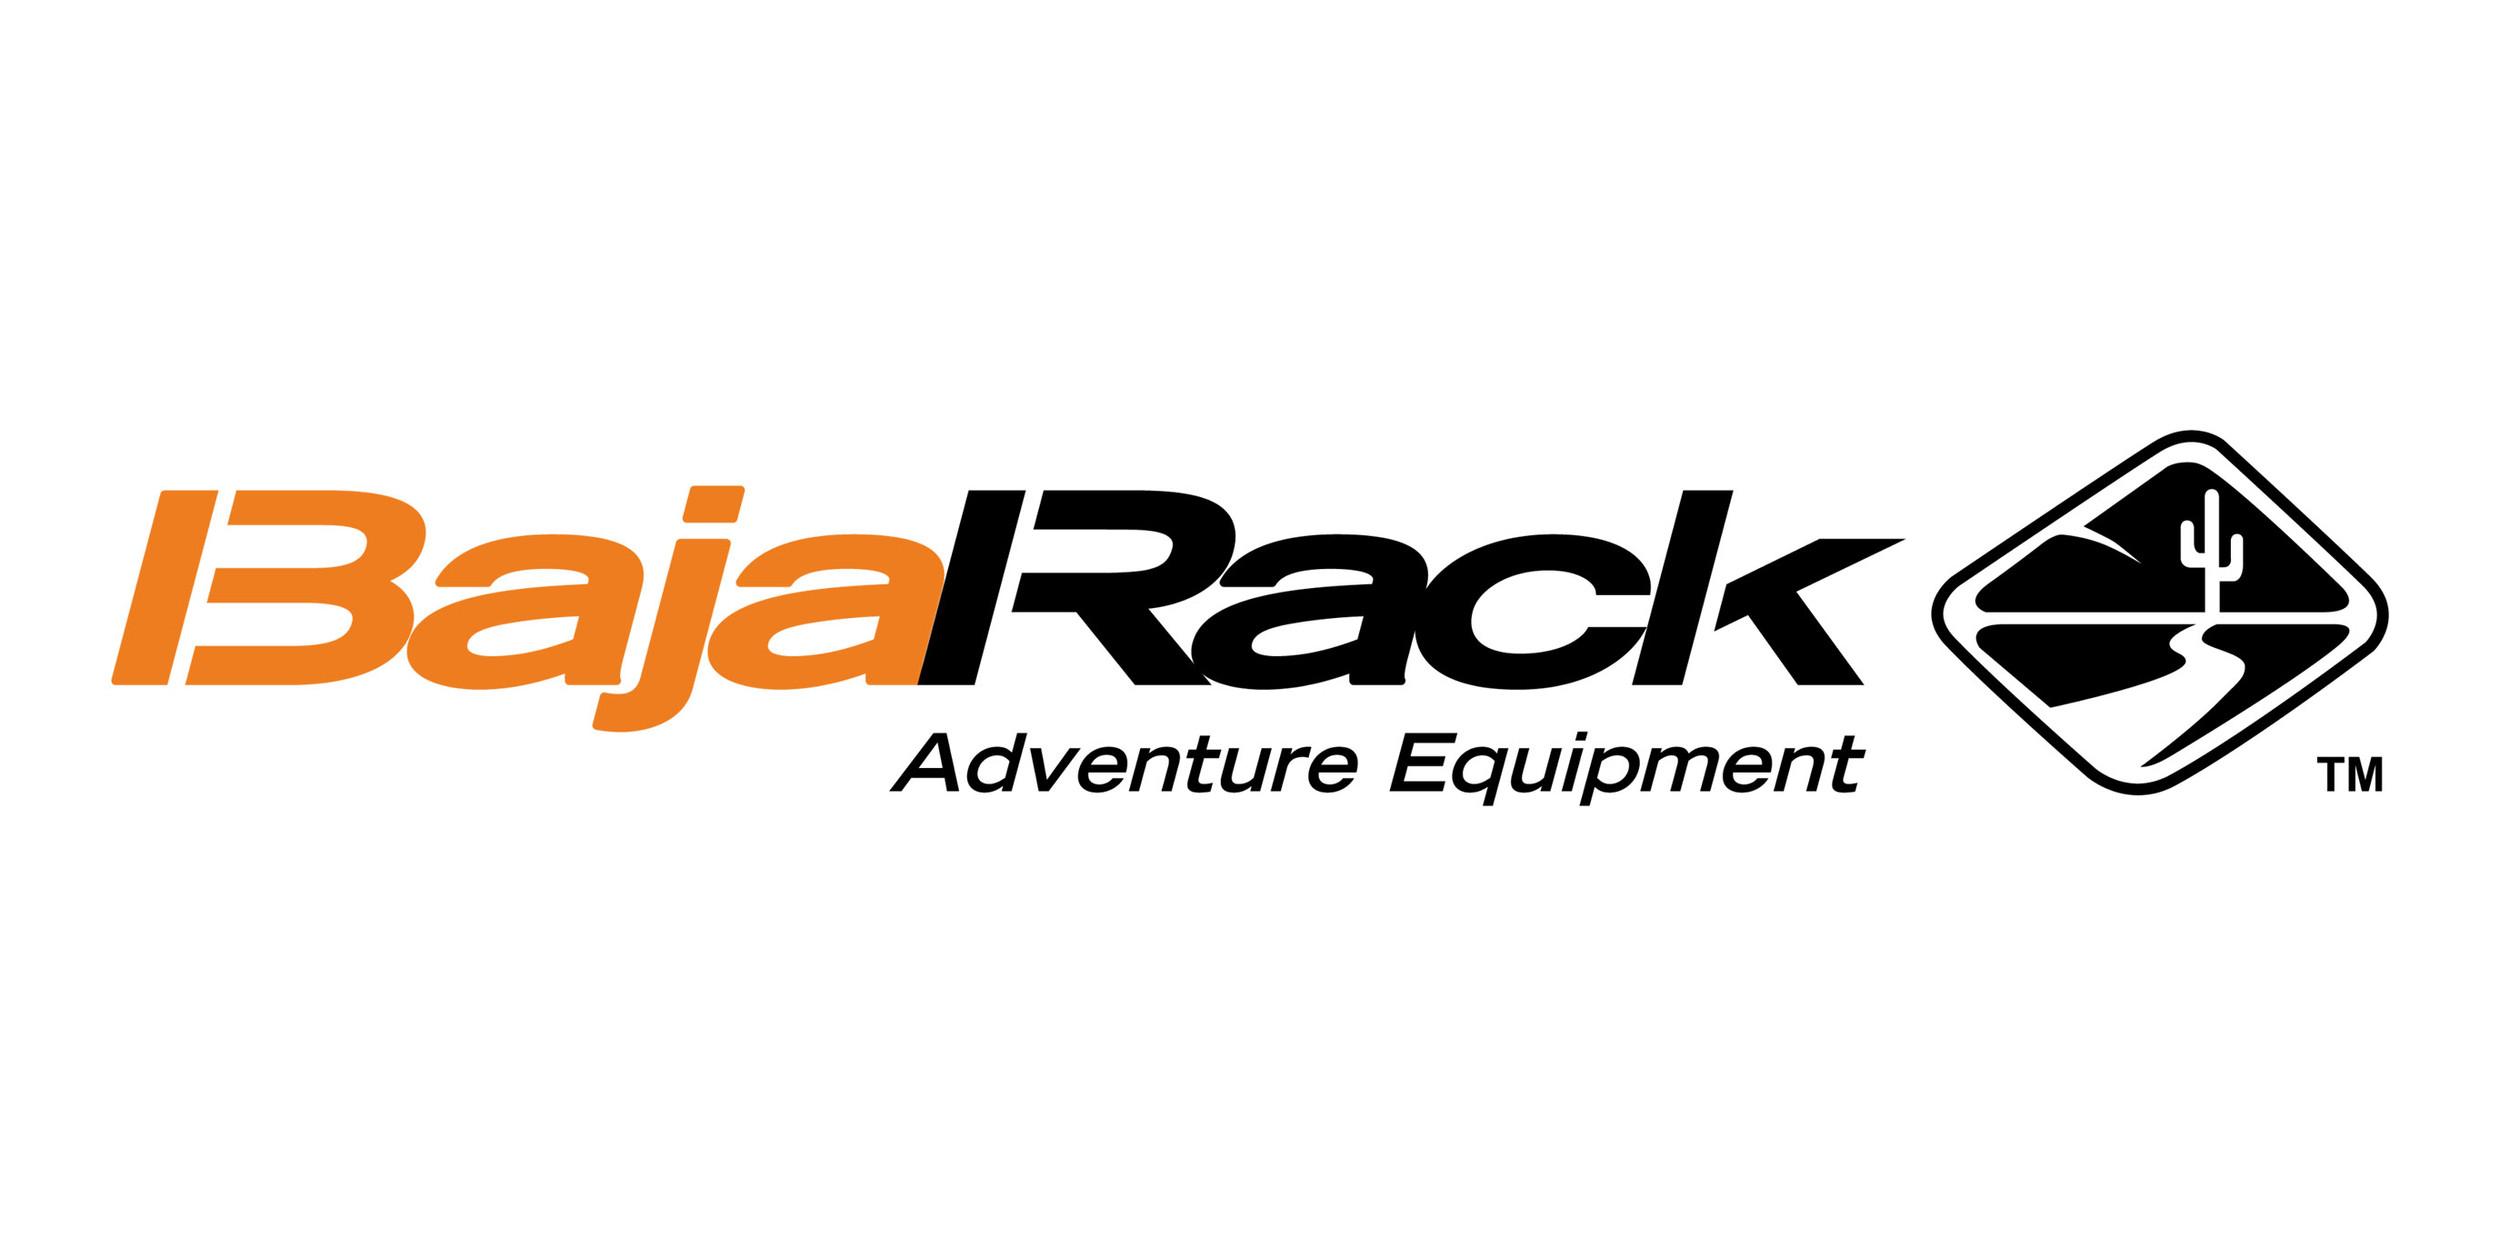 www.bajarack.com